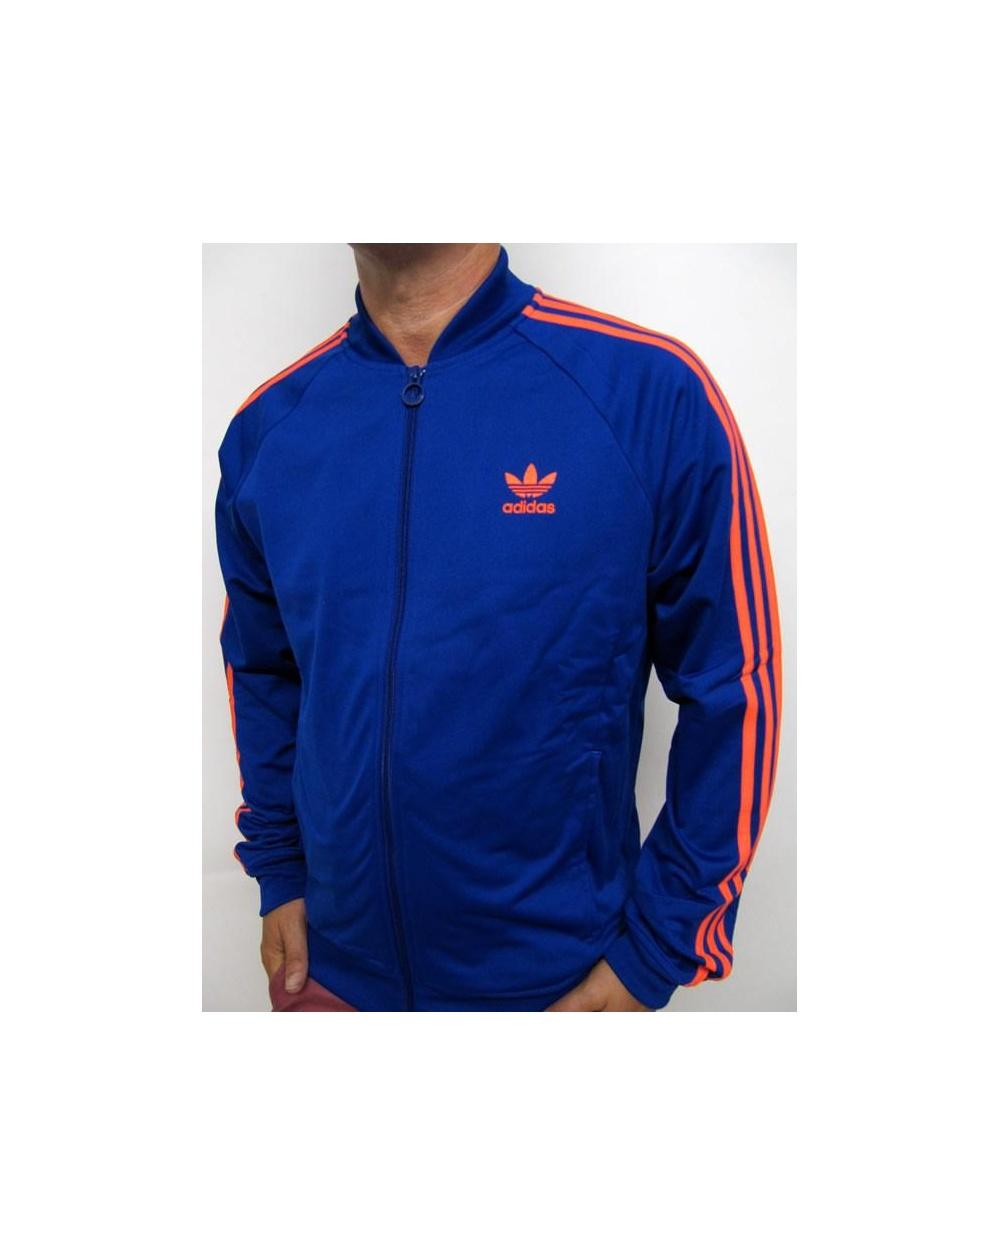 Adidas Top Ten Hi Sleek Bow Zip Trainers: Adidas Originals Superstar Track Top Royal/Infra Red